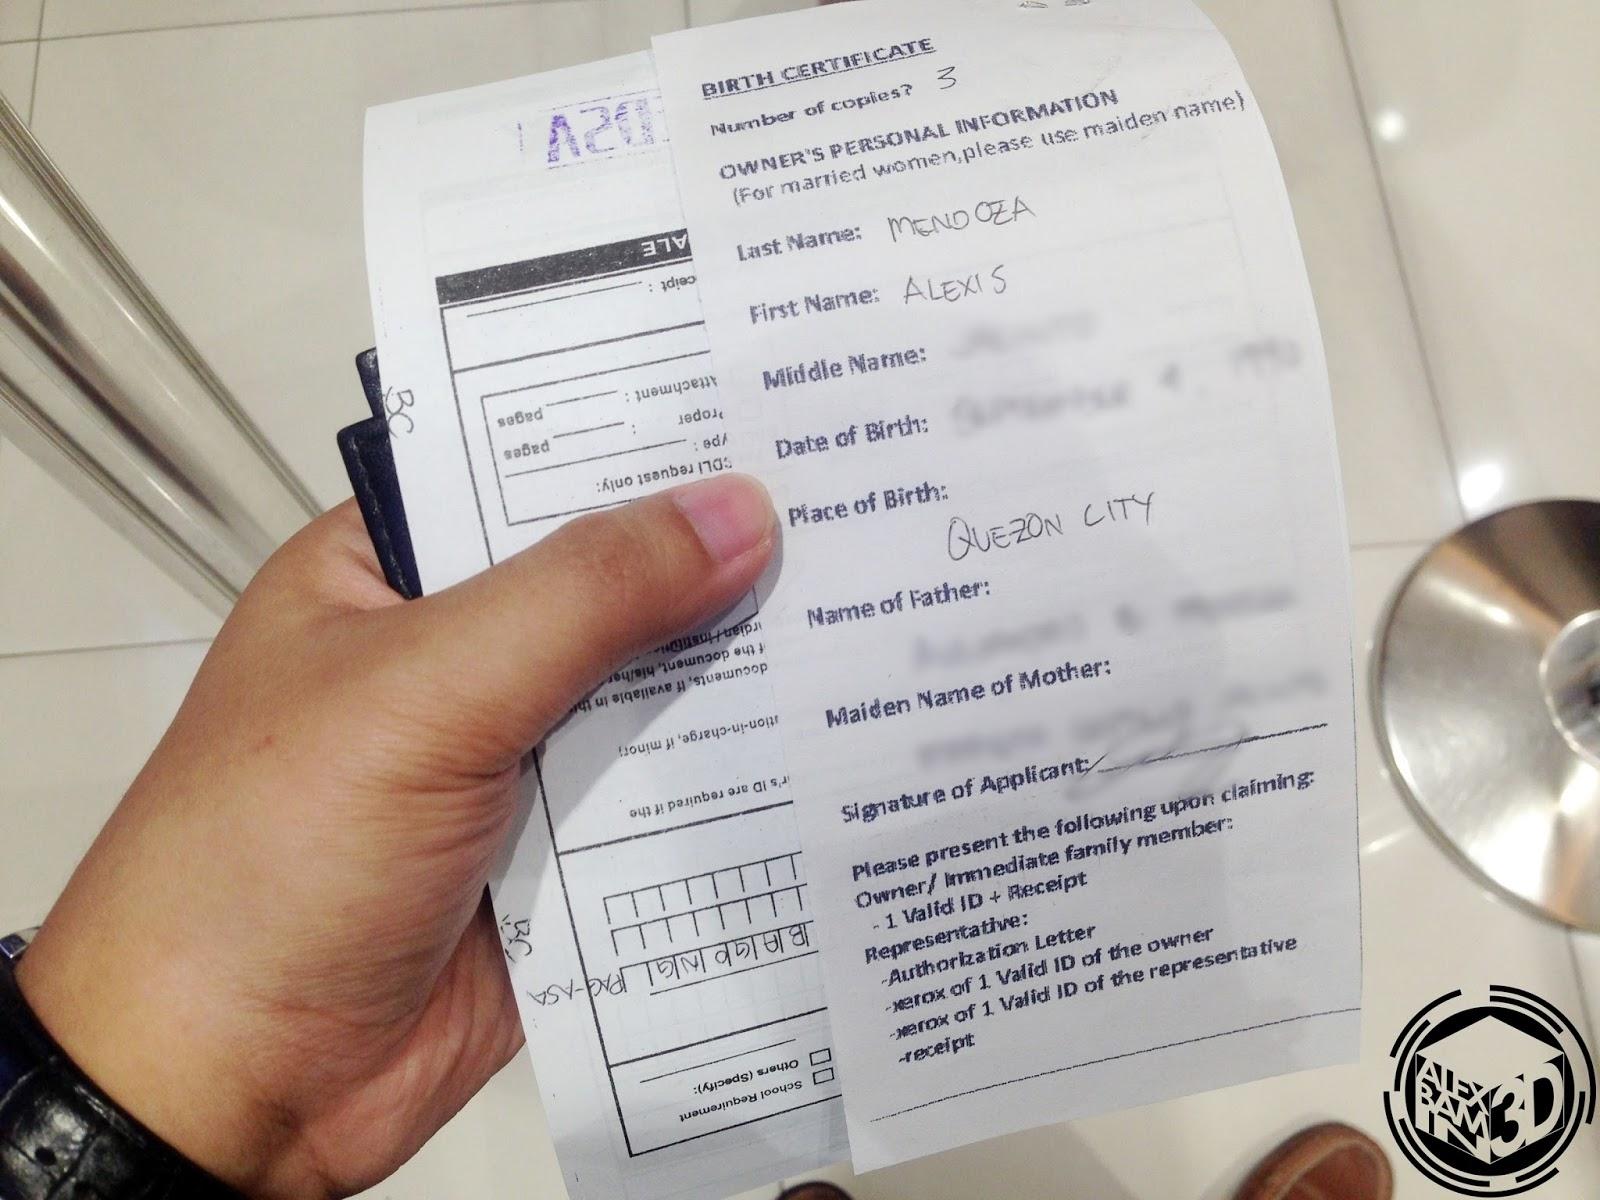 Free Resume 2018 » quickest way to get birth certificate | Free Resume